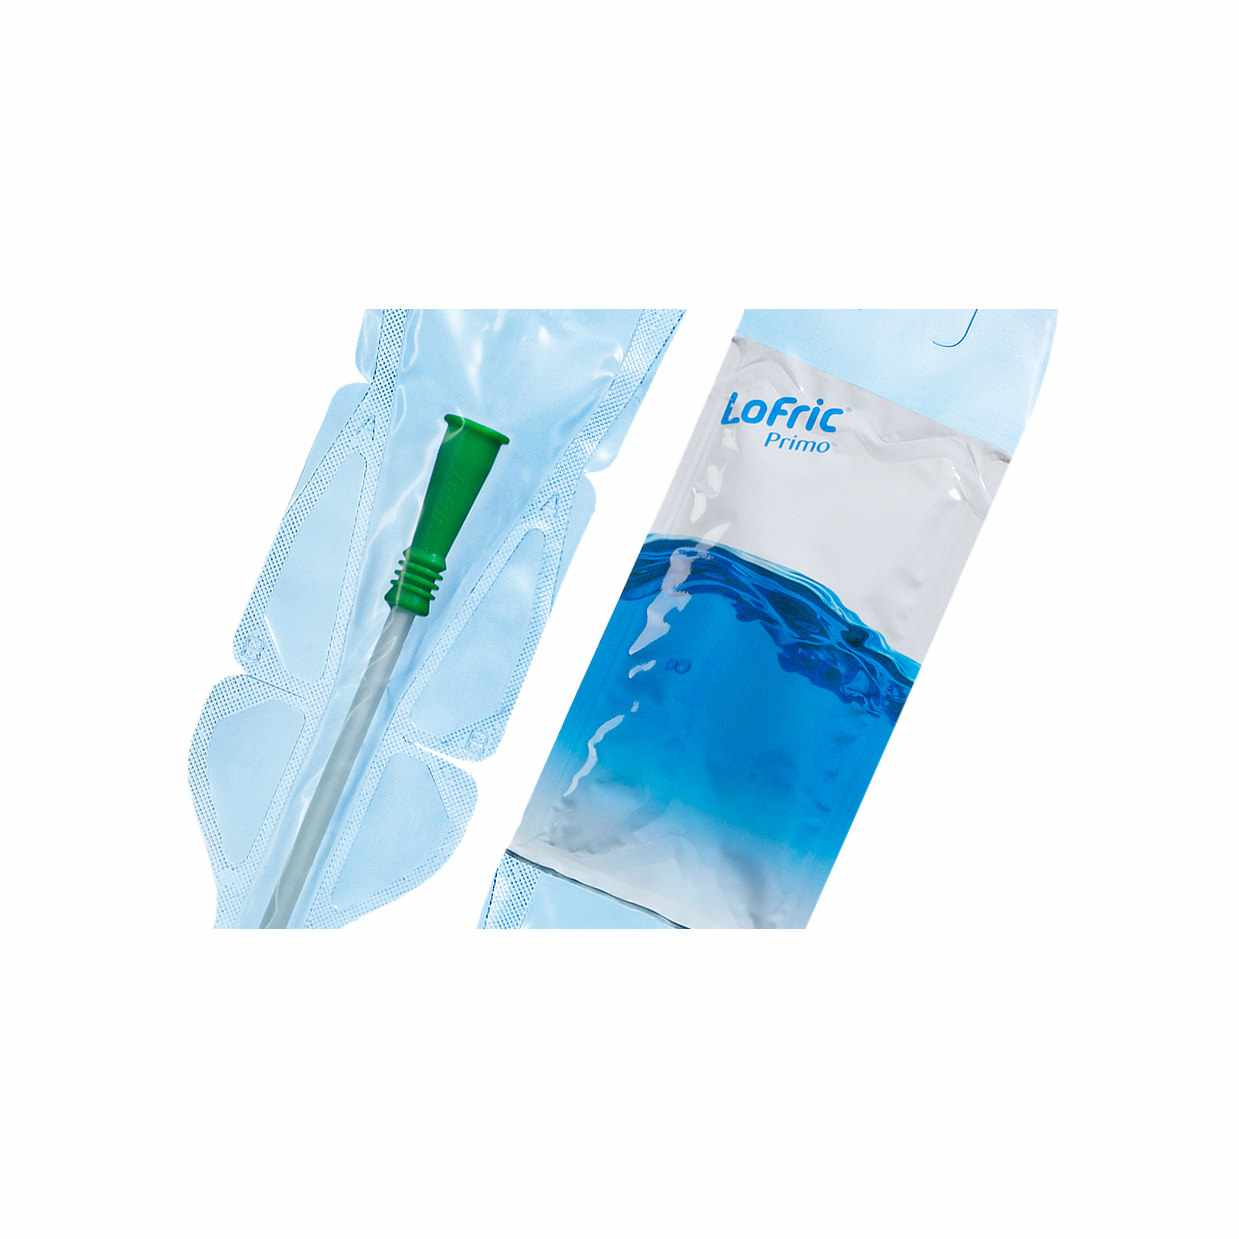 Wellspect LoFric Primo Male Hydrophilic Intermittent Catheter, 16 Fr